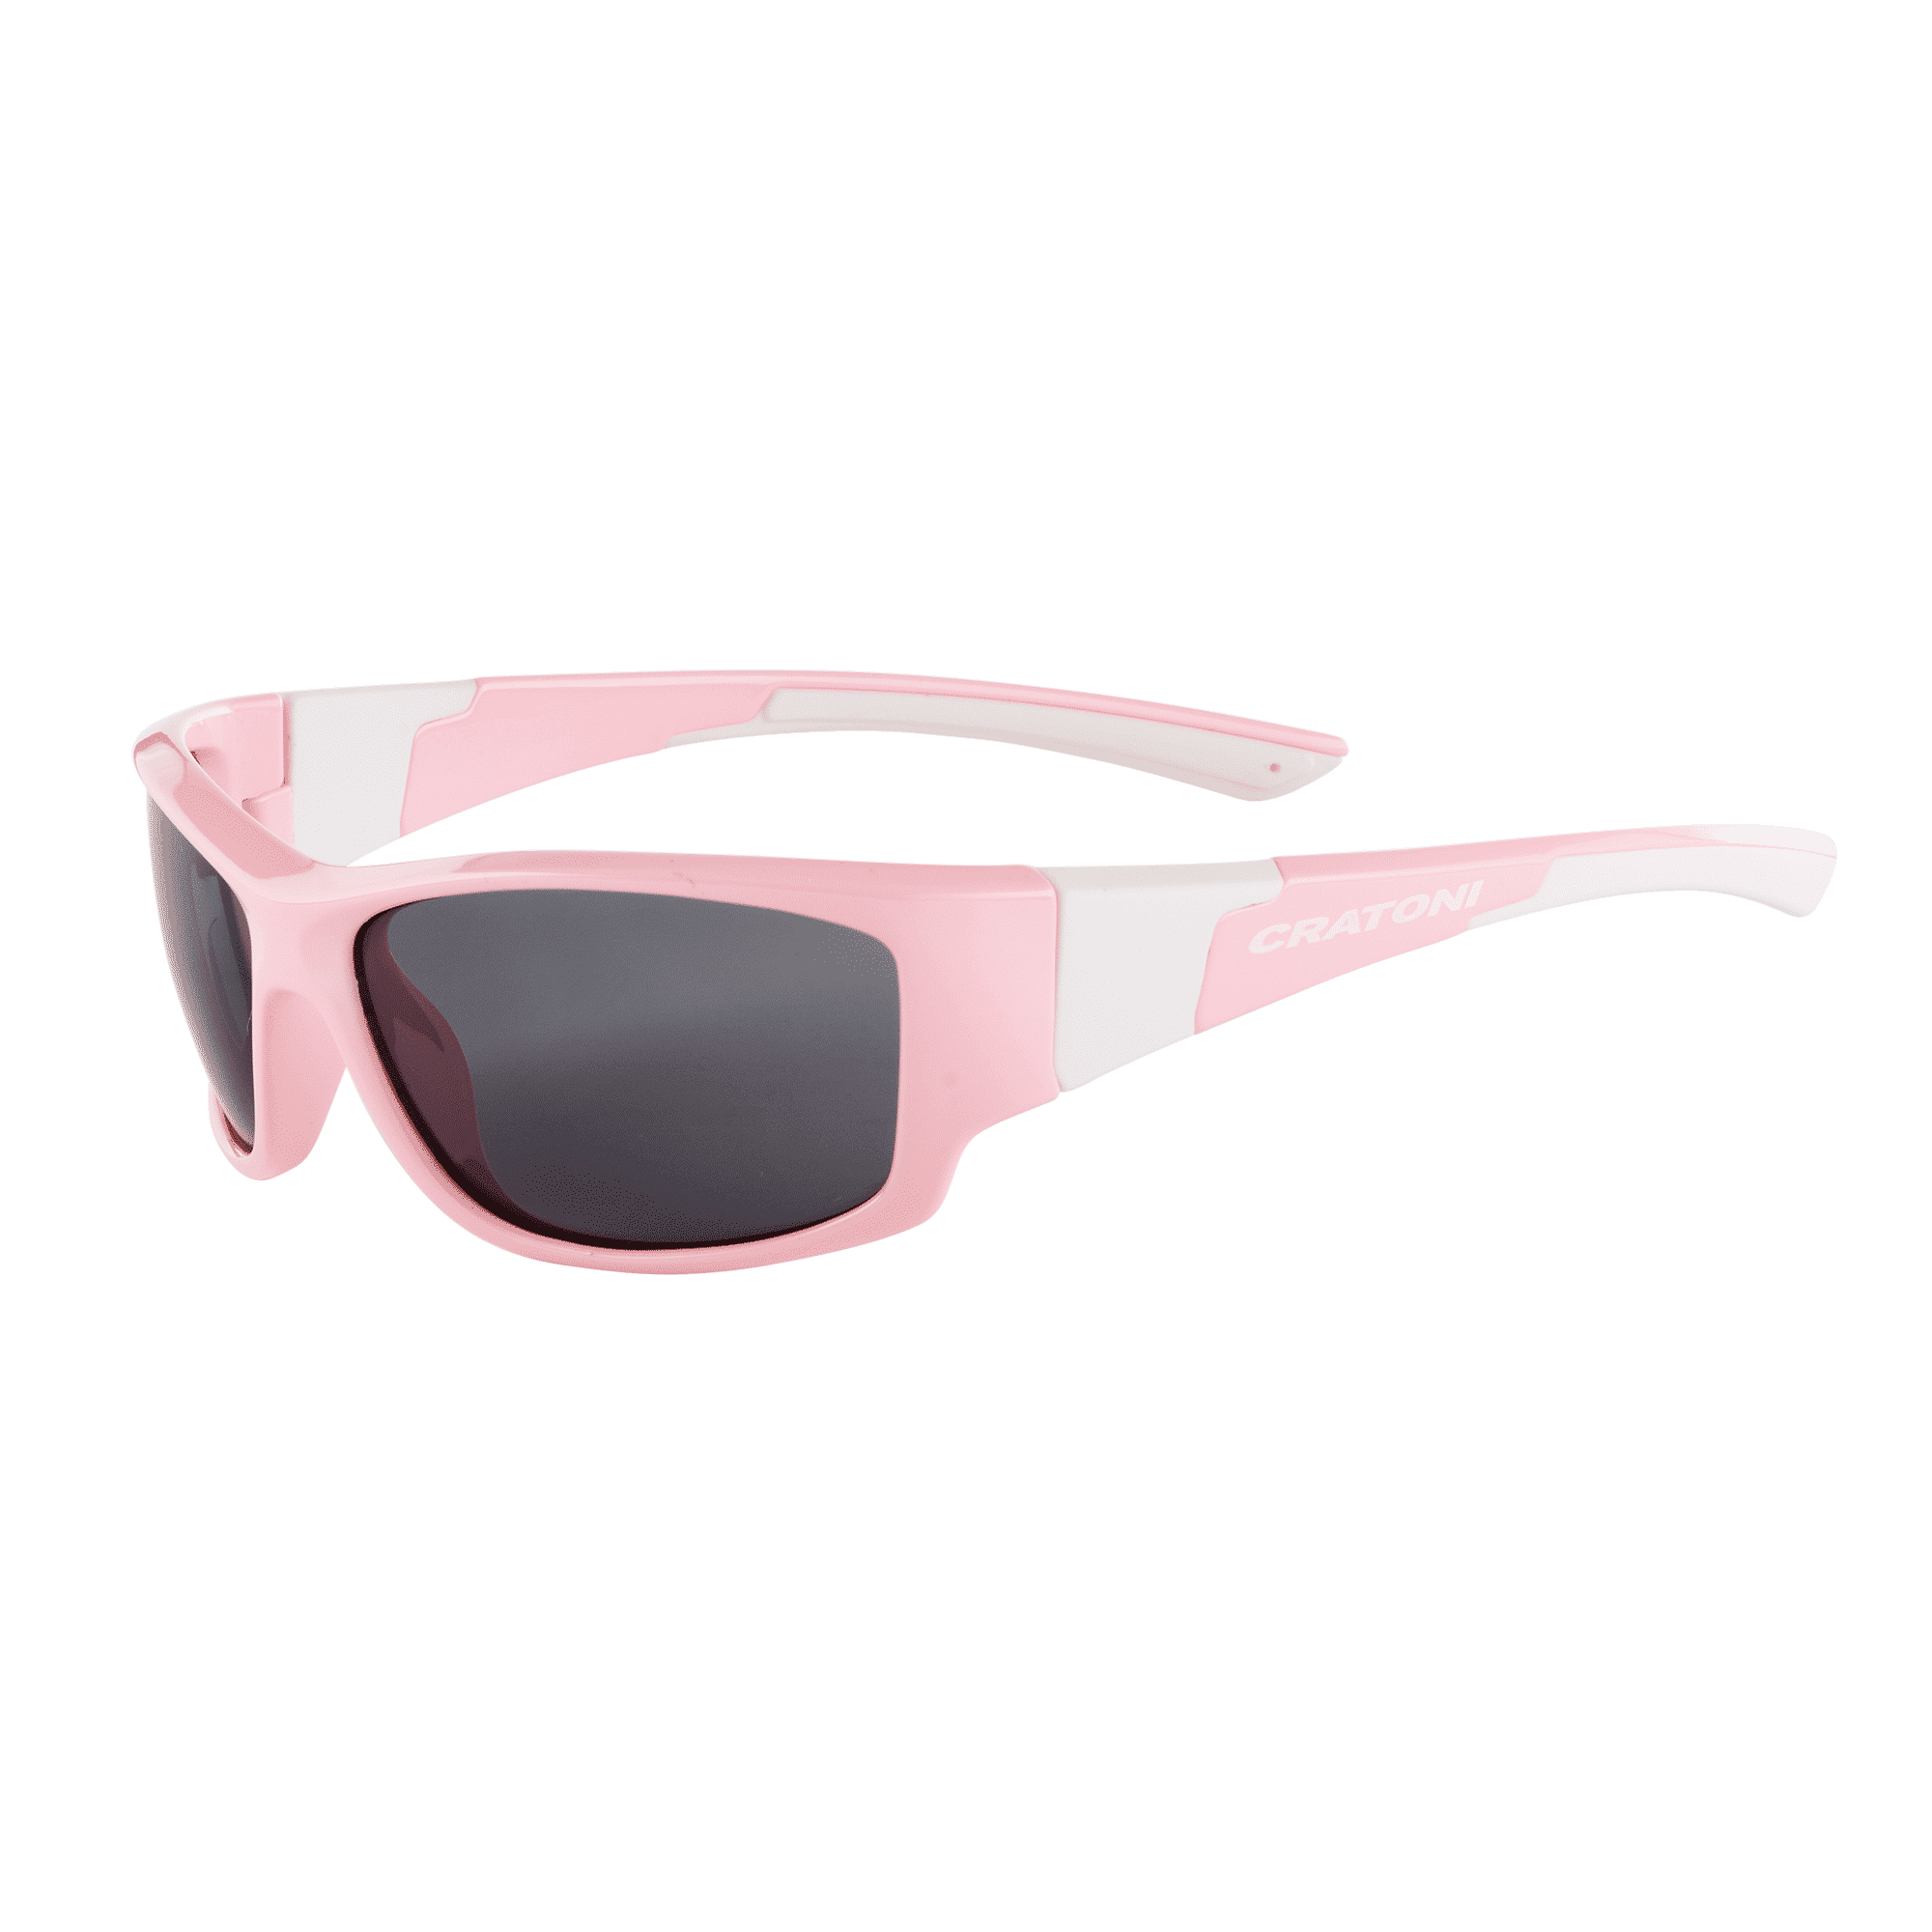 Cratoni C-Spin rose-white-glossy